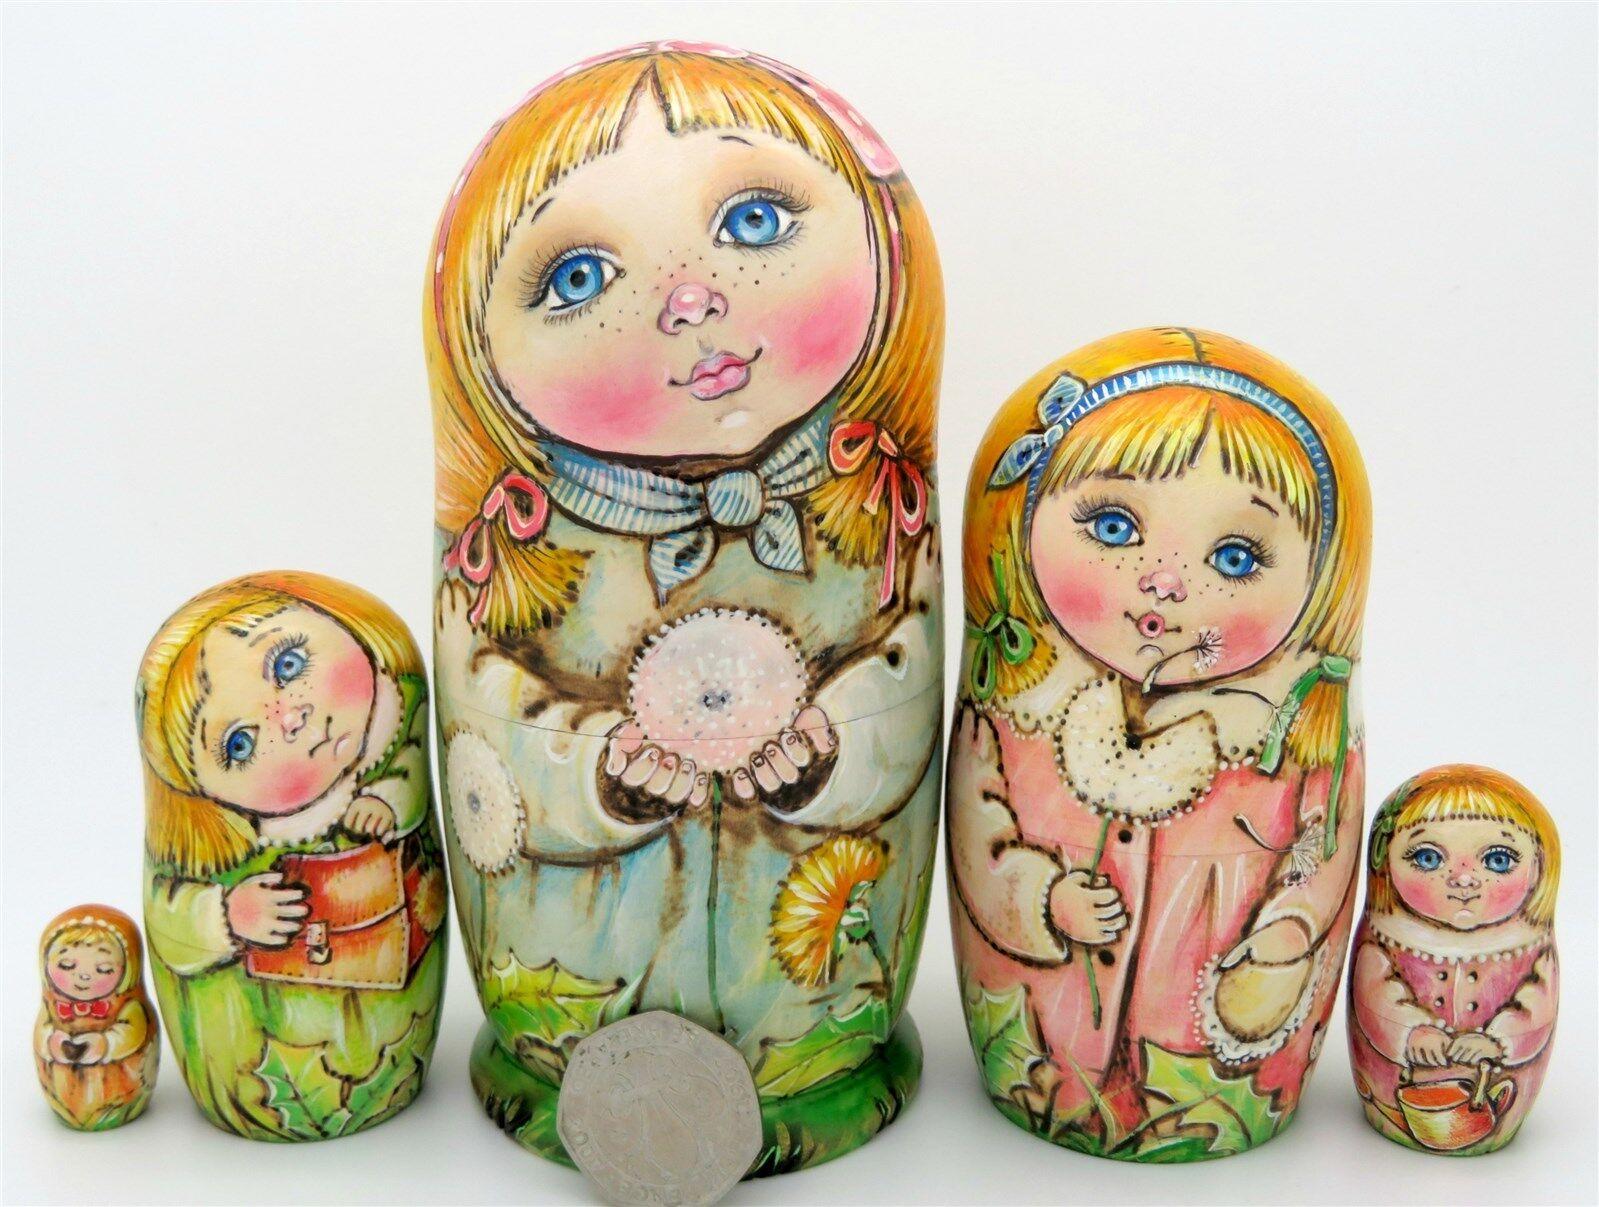 Nidification poupées Russes Matryoshka Babushka 5 pyrogravure filles Chmeleva Exclusive